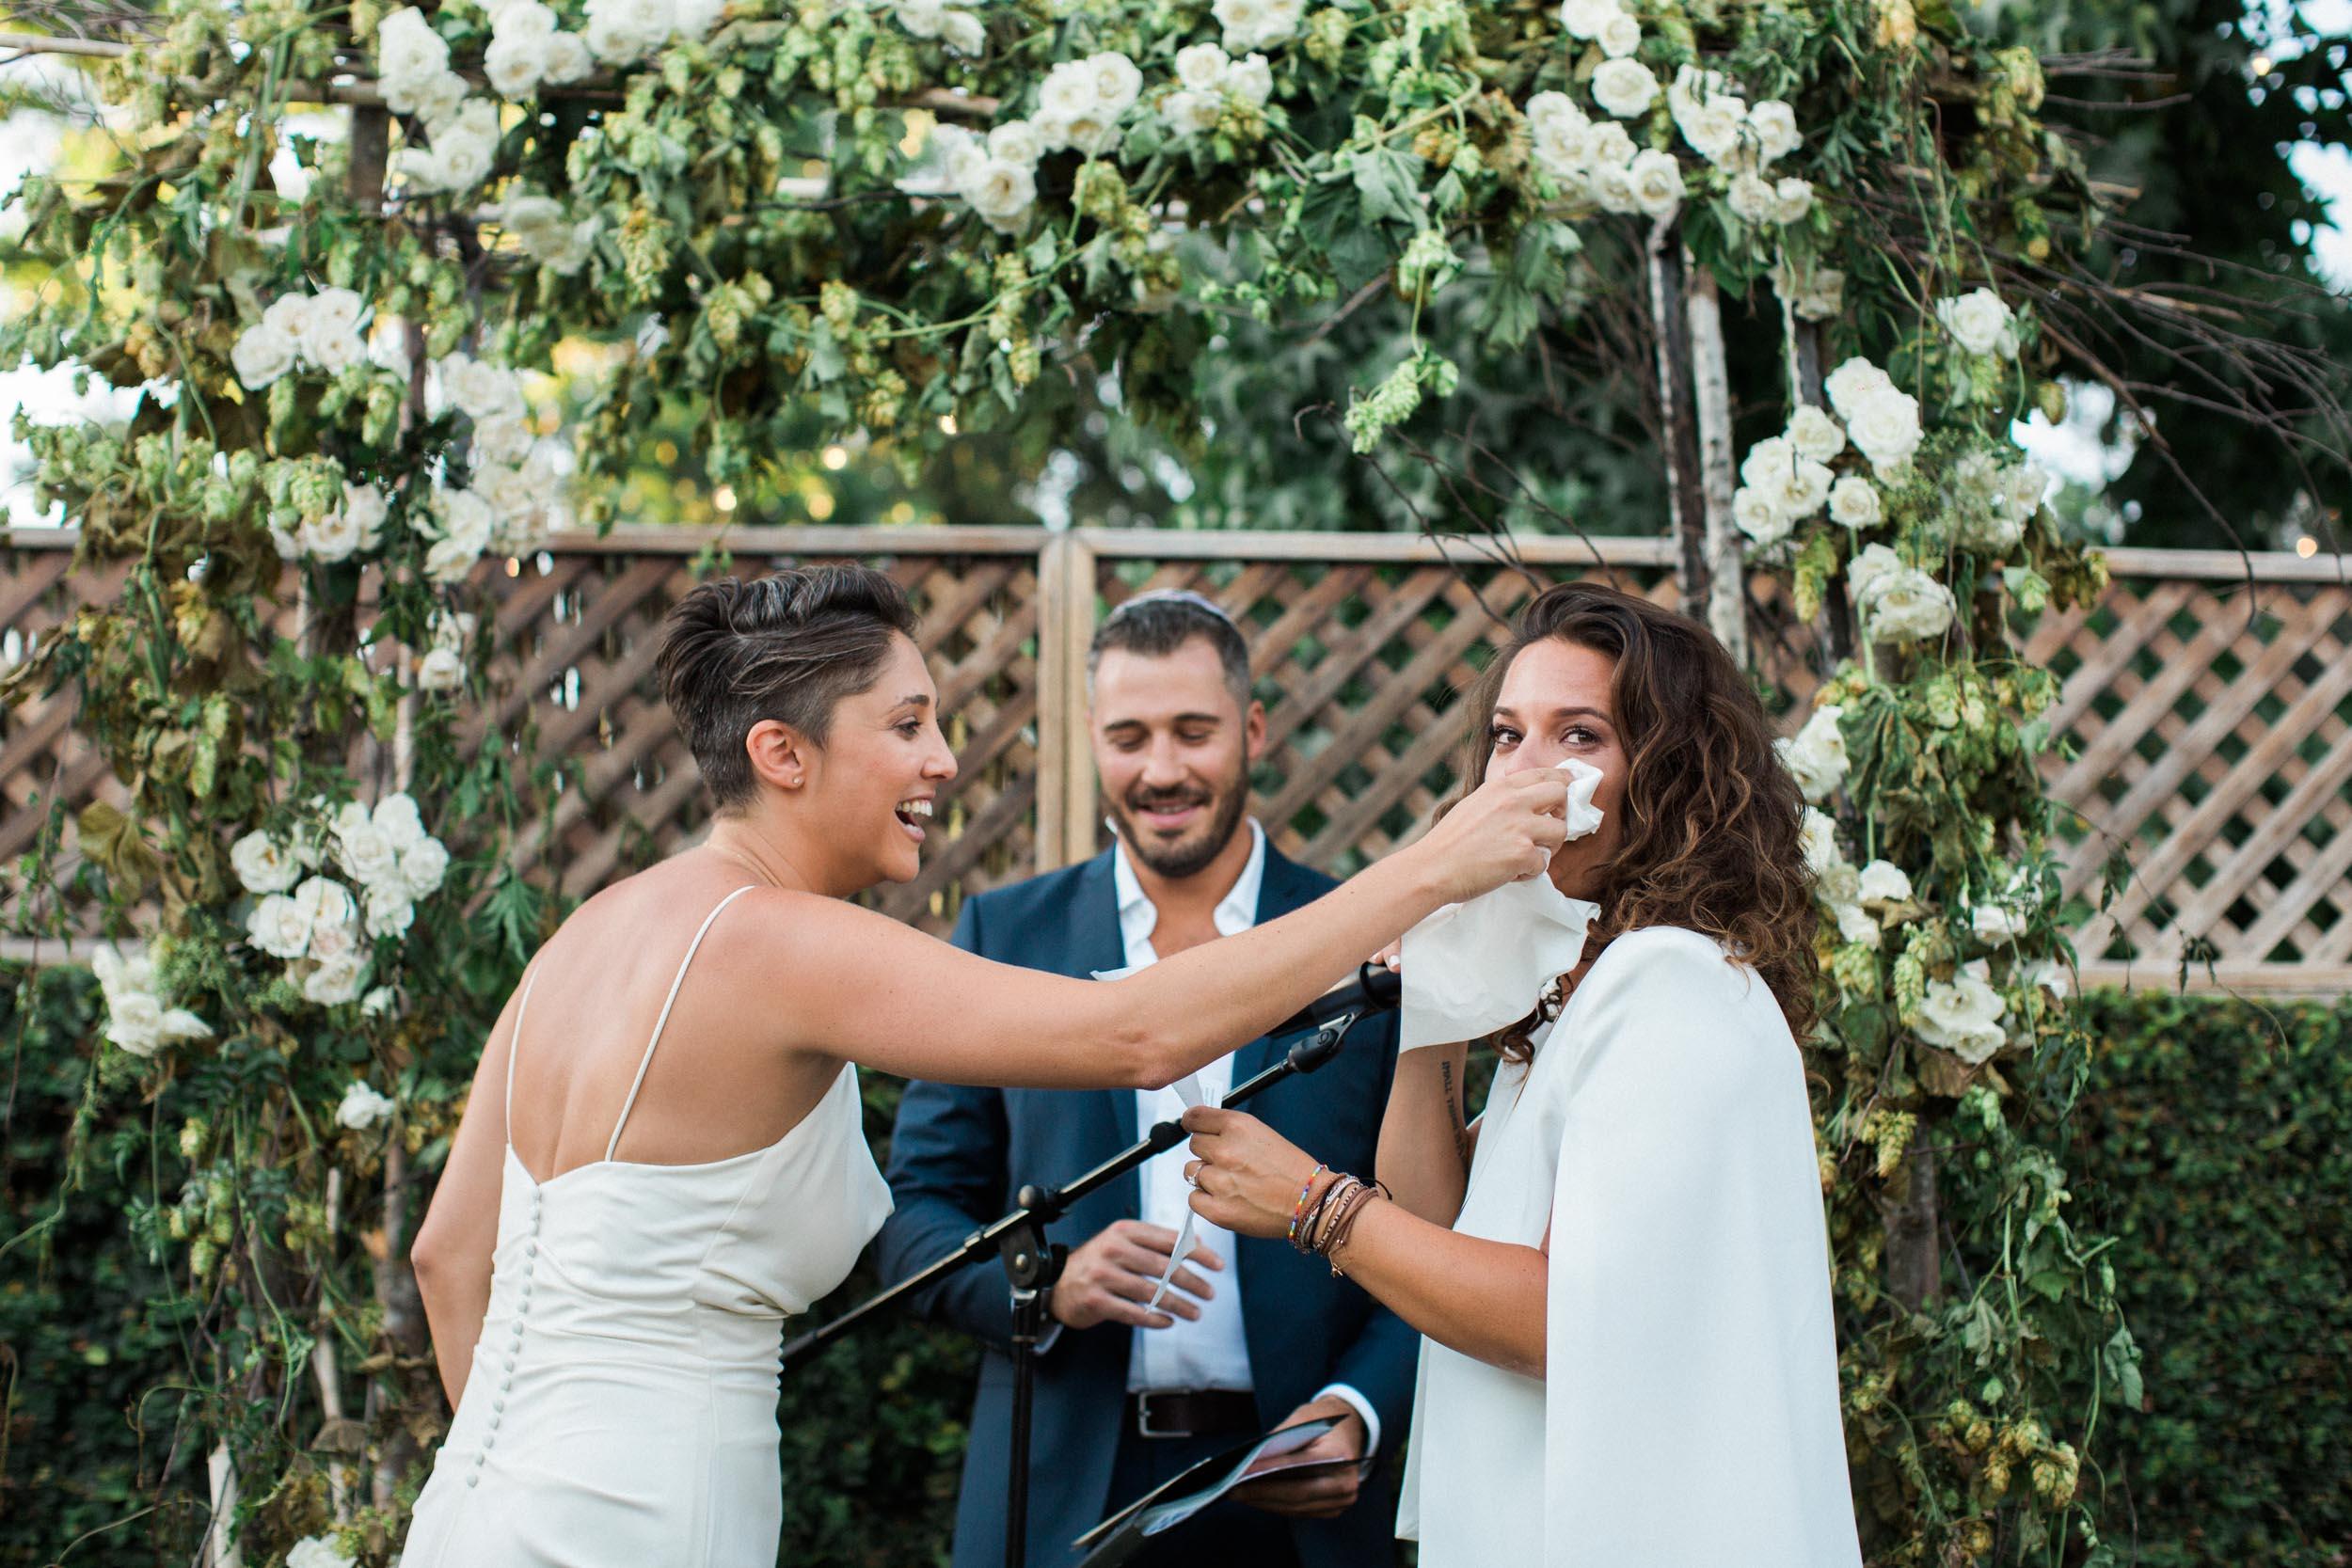 BKM-Photography-La-Canada-Flintridge-Backyard-Wedding-Los-Angeles-LQBTQ-Lesbian-Photographer-0067.jpg